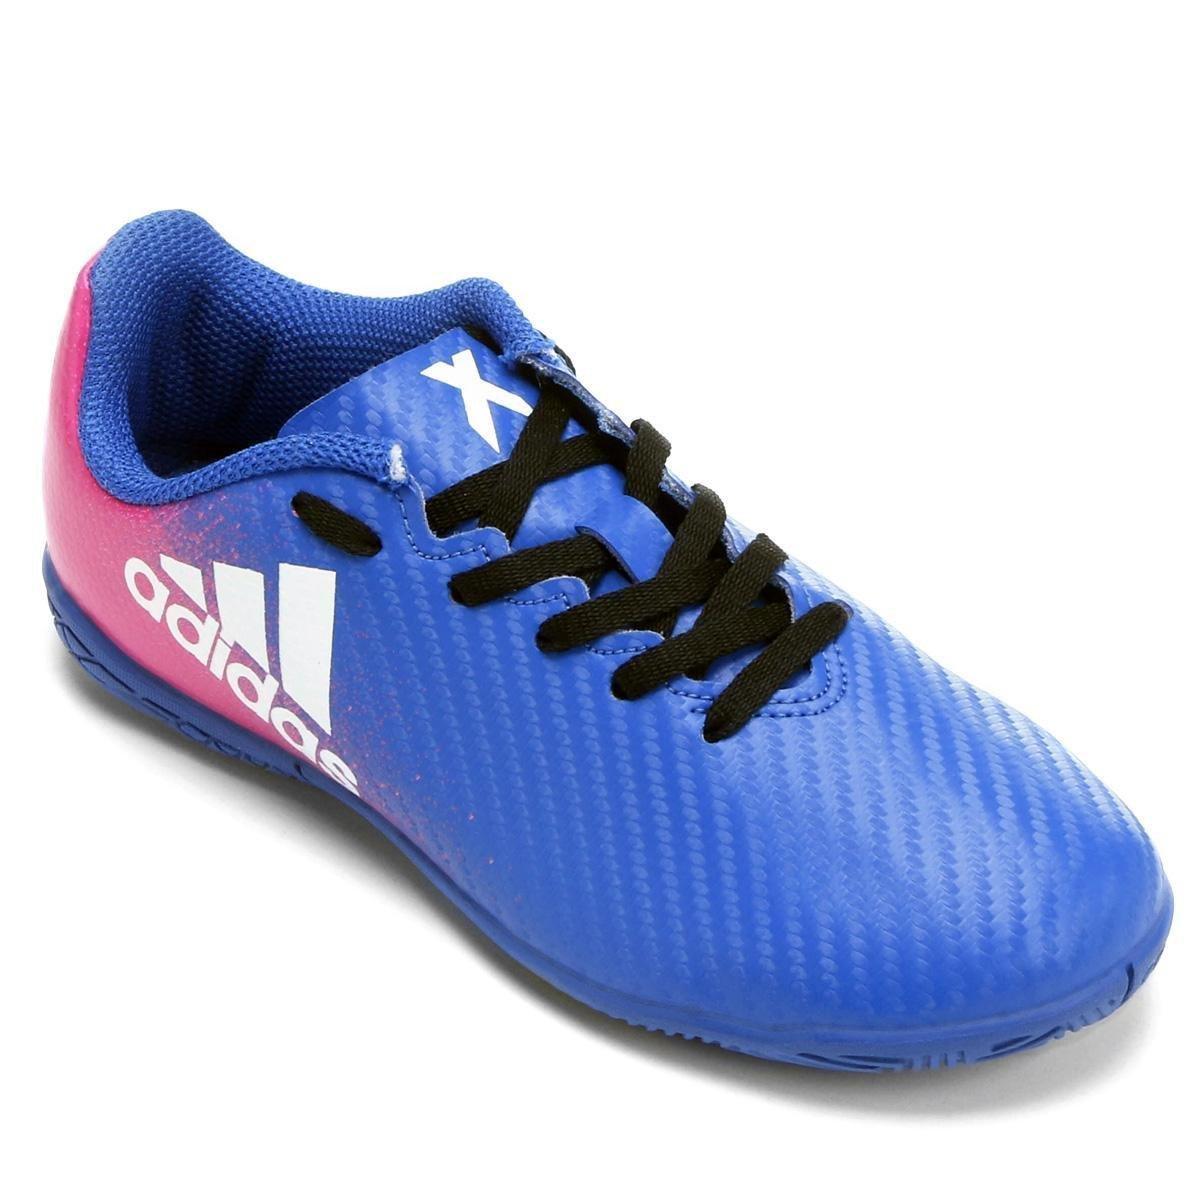 02632f2d55ee9 Chuteira Futsal Juvenil Adidas X 16 4 IN | Allianz Parque Shop